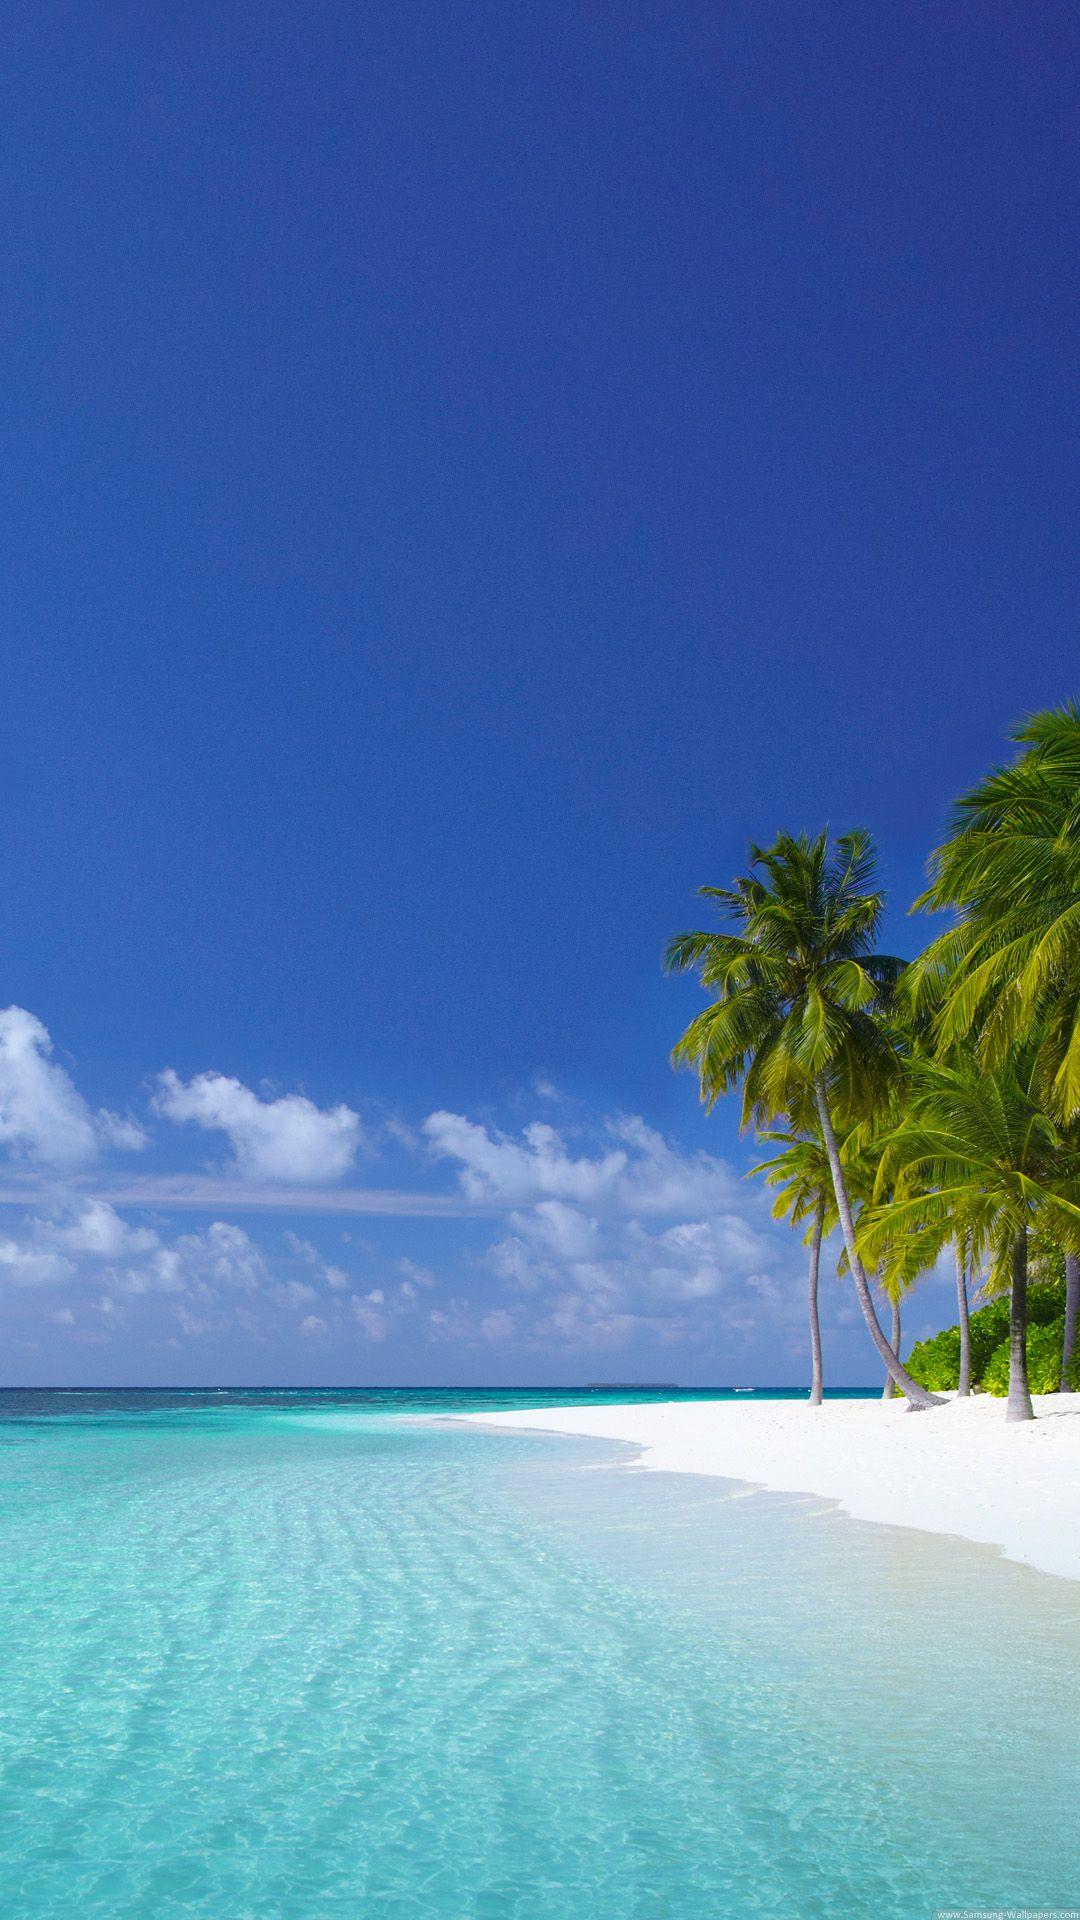 خلفيات هاتف سامسونج جالاكسي نوت 4 عالية الدقة Beach Wallpaper Beautiful Landscapes Beautiful Nature